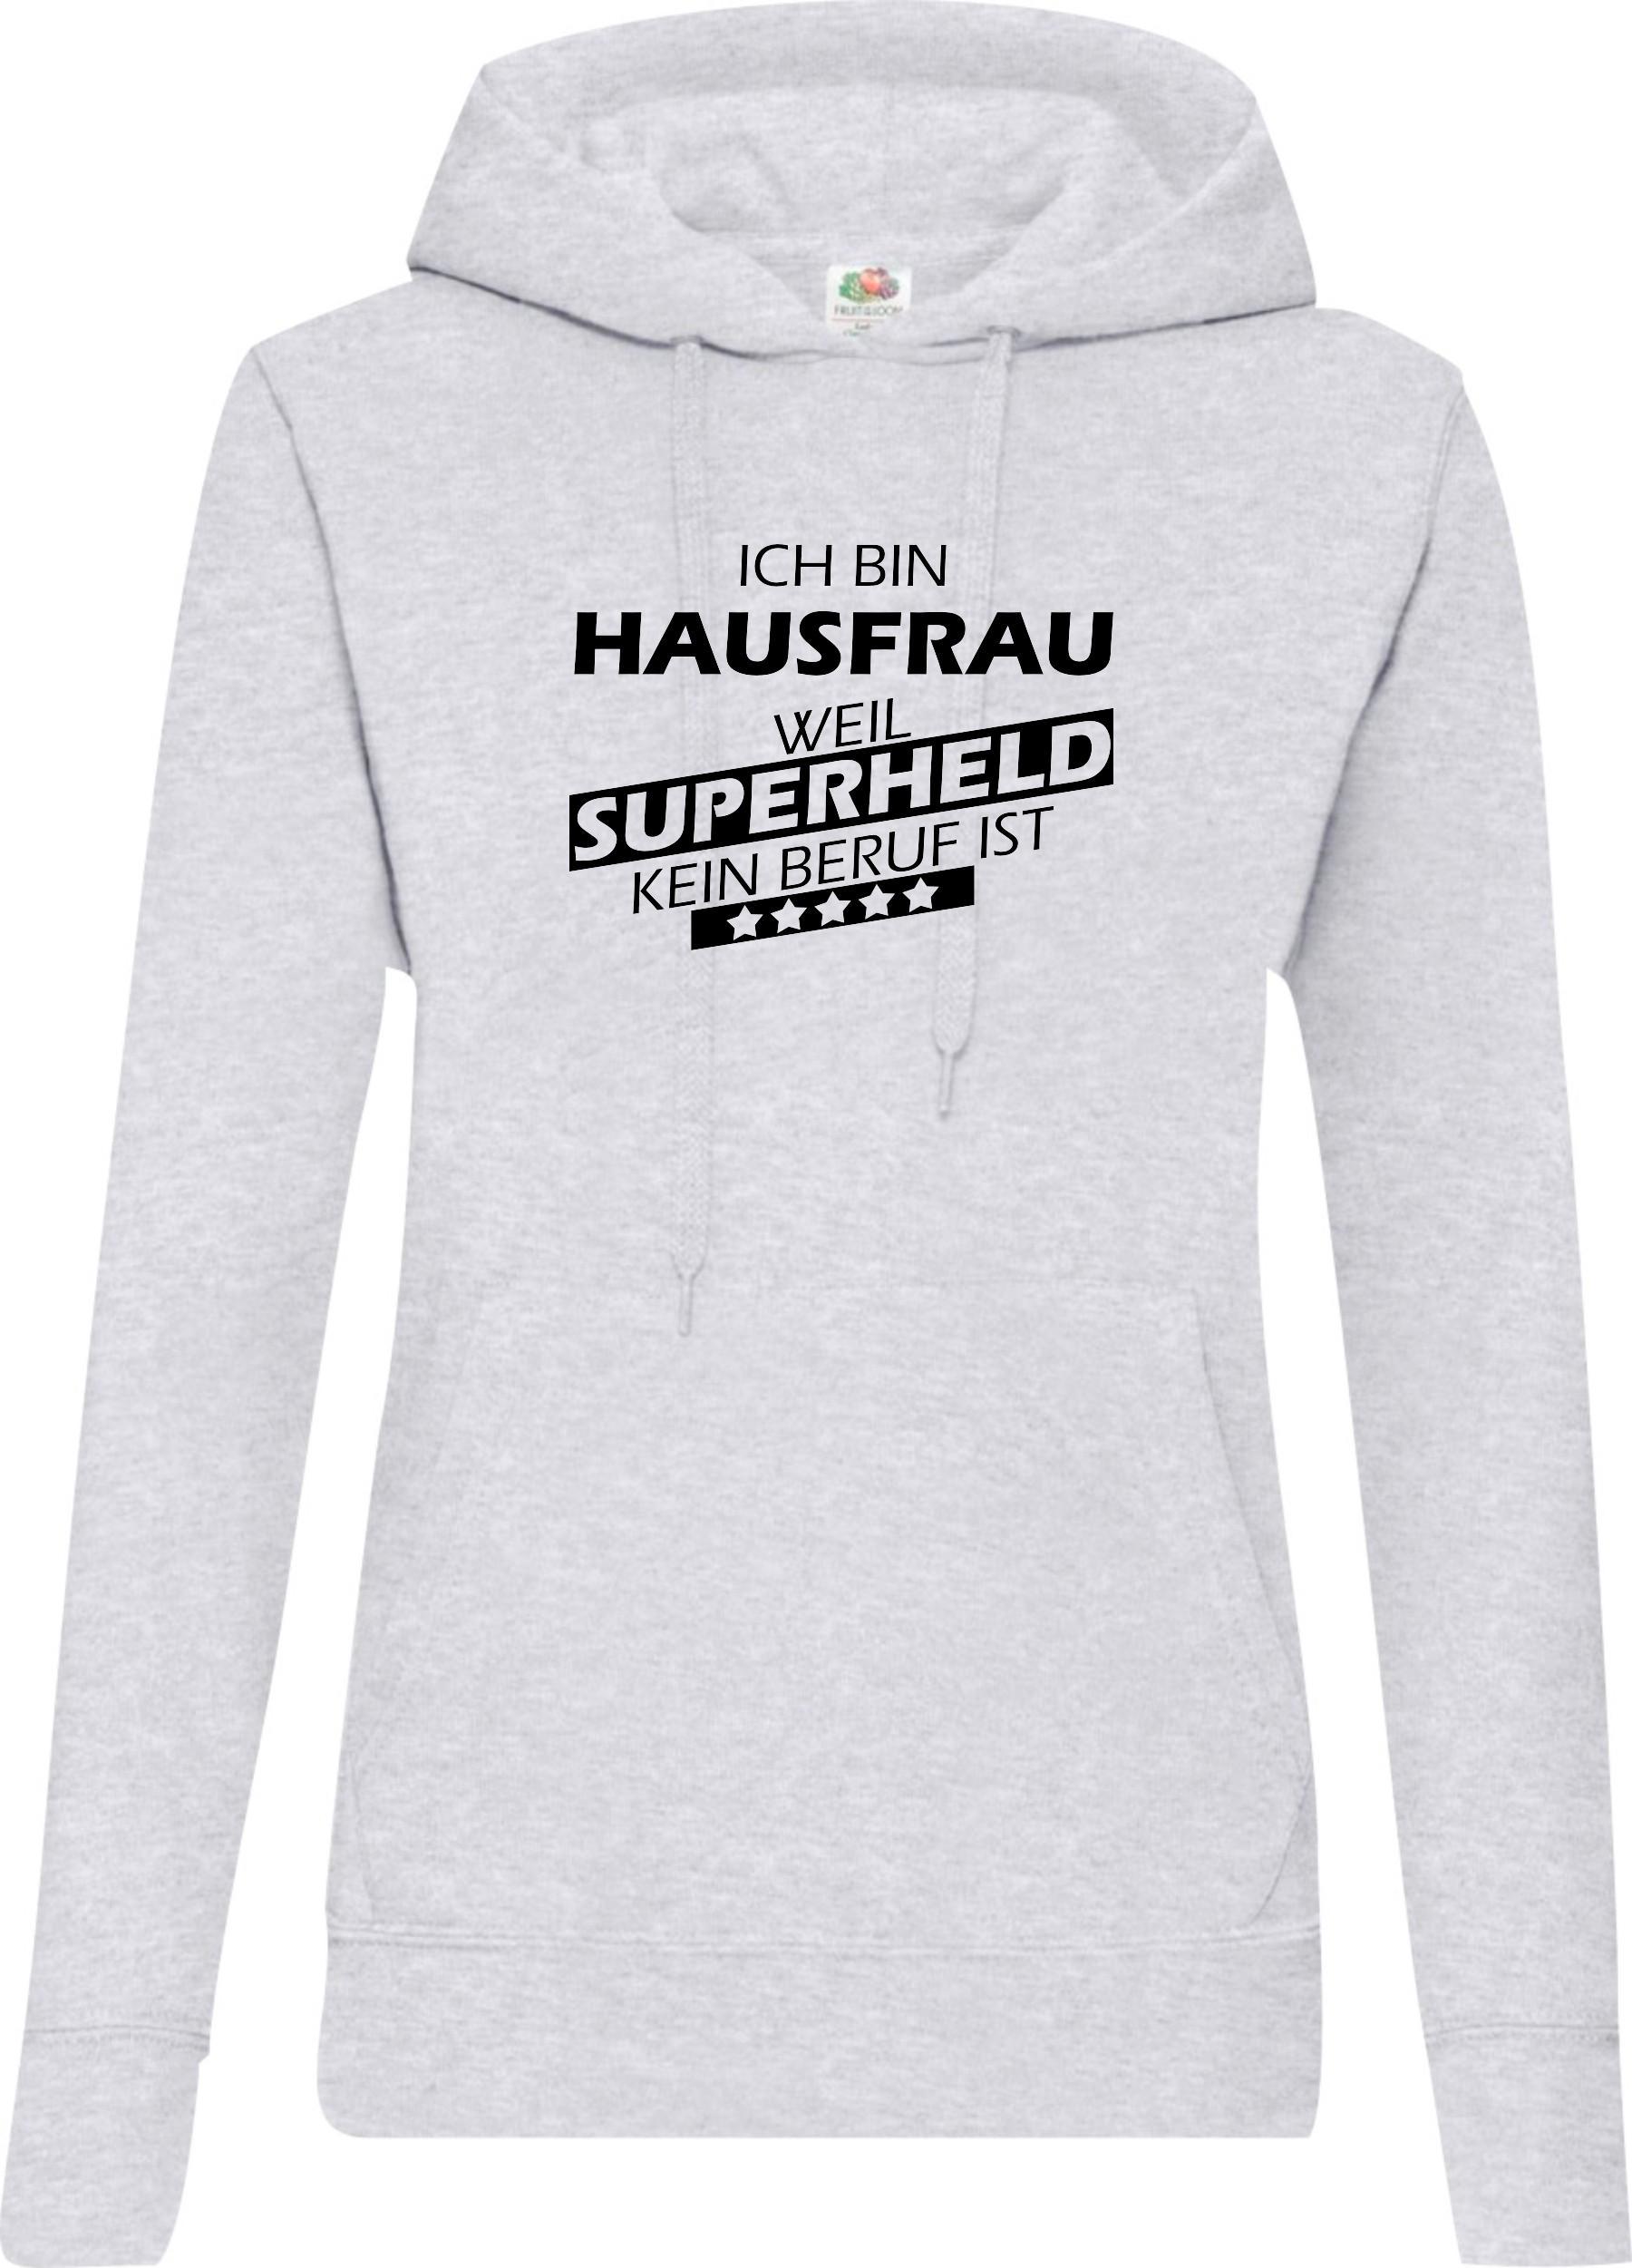 Lady-Kapuzensweatshirt-Ich-bin-Hausfrau-weil-Superheld-kein-Beruf-ist-Groessen-X